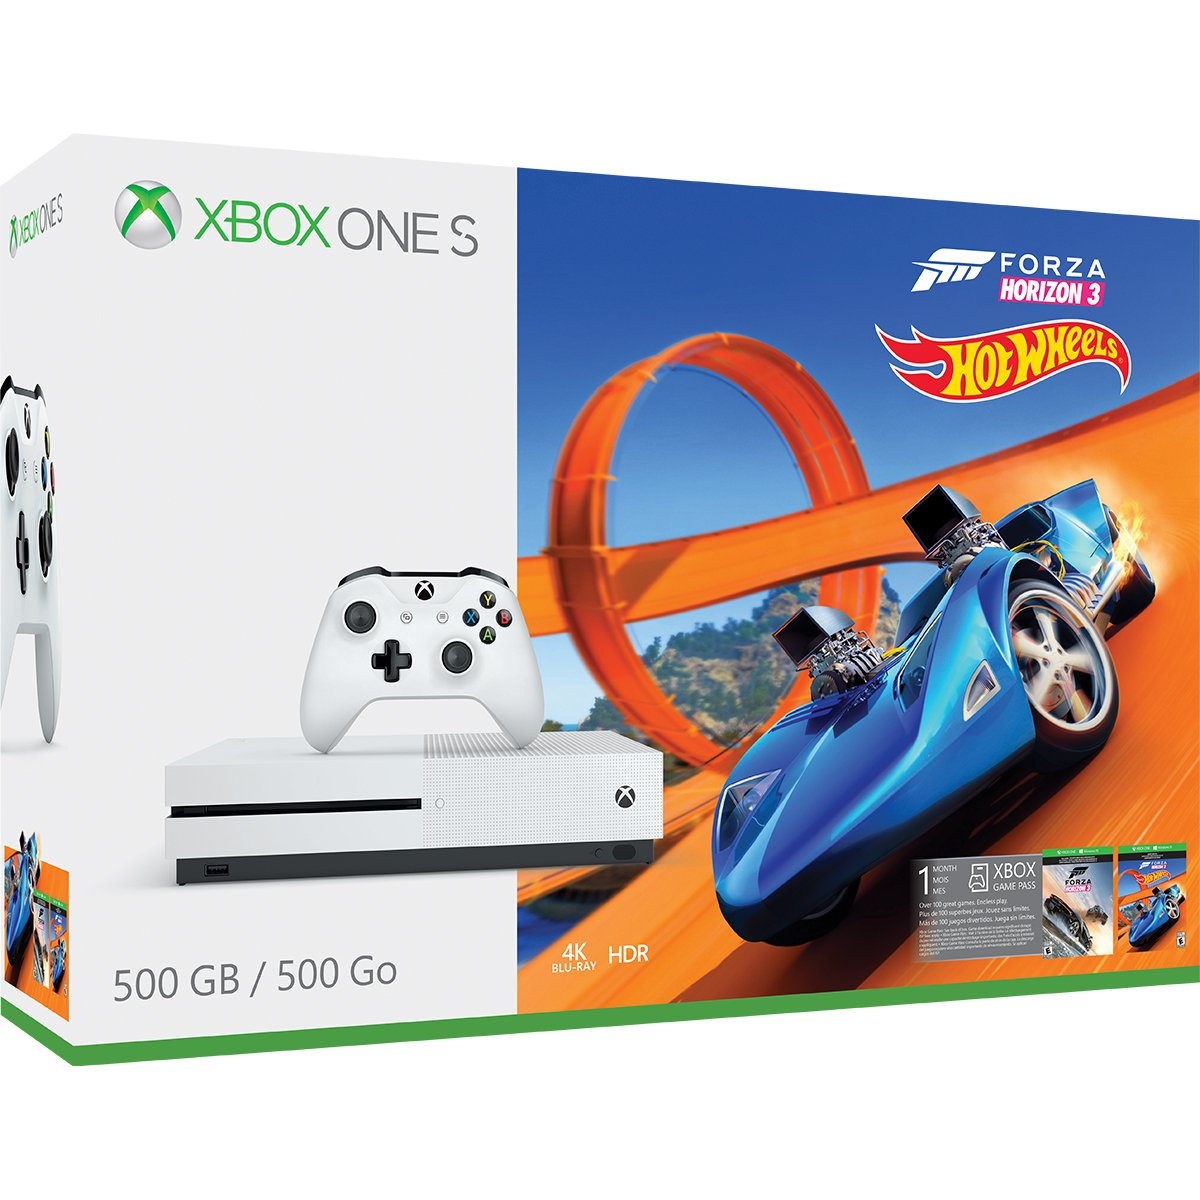 Xbox One S 500GB Console - Forza Horizon 3 Hot Wheels Bundle